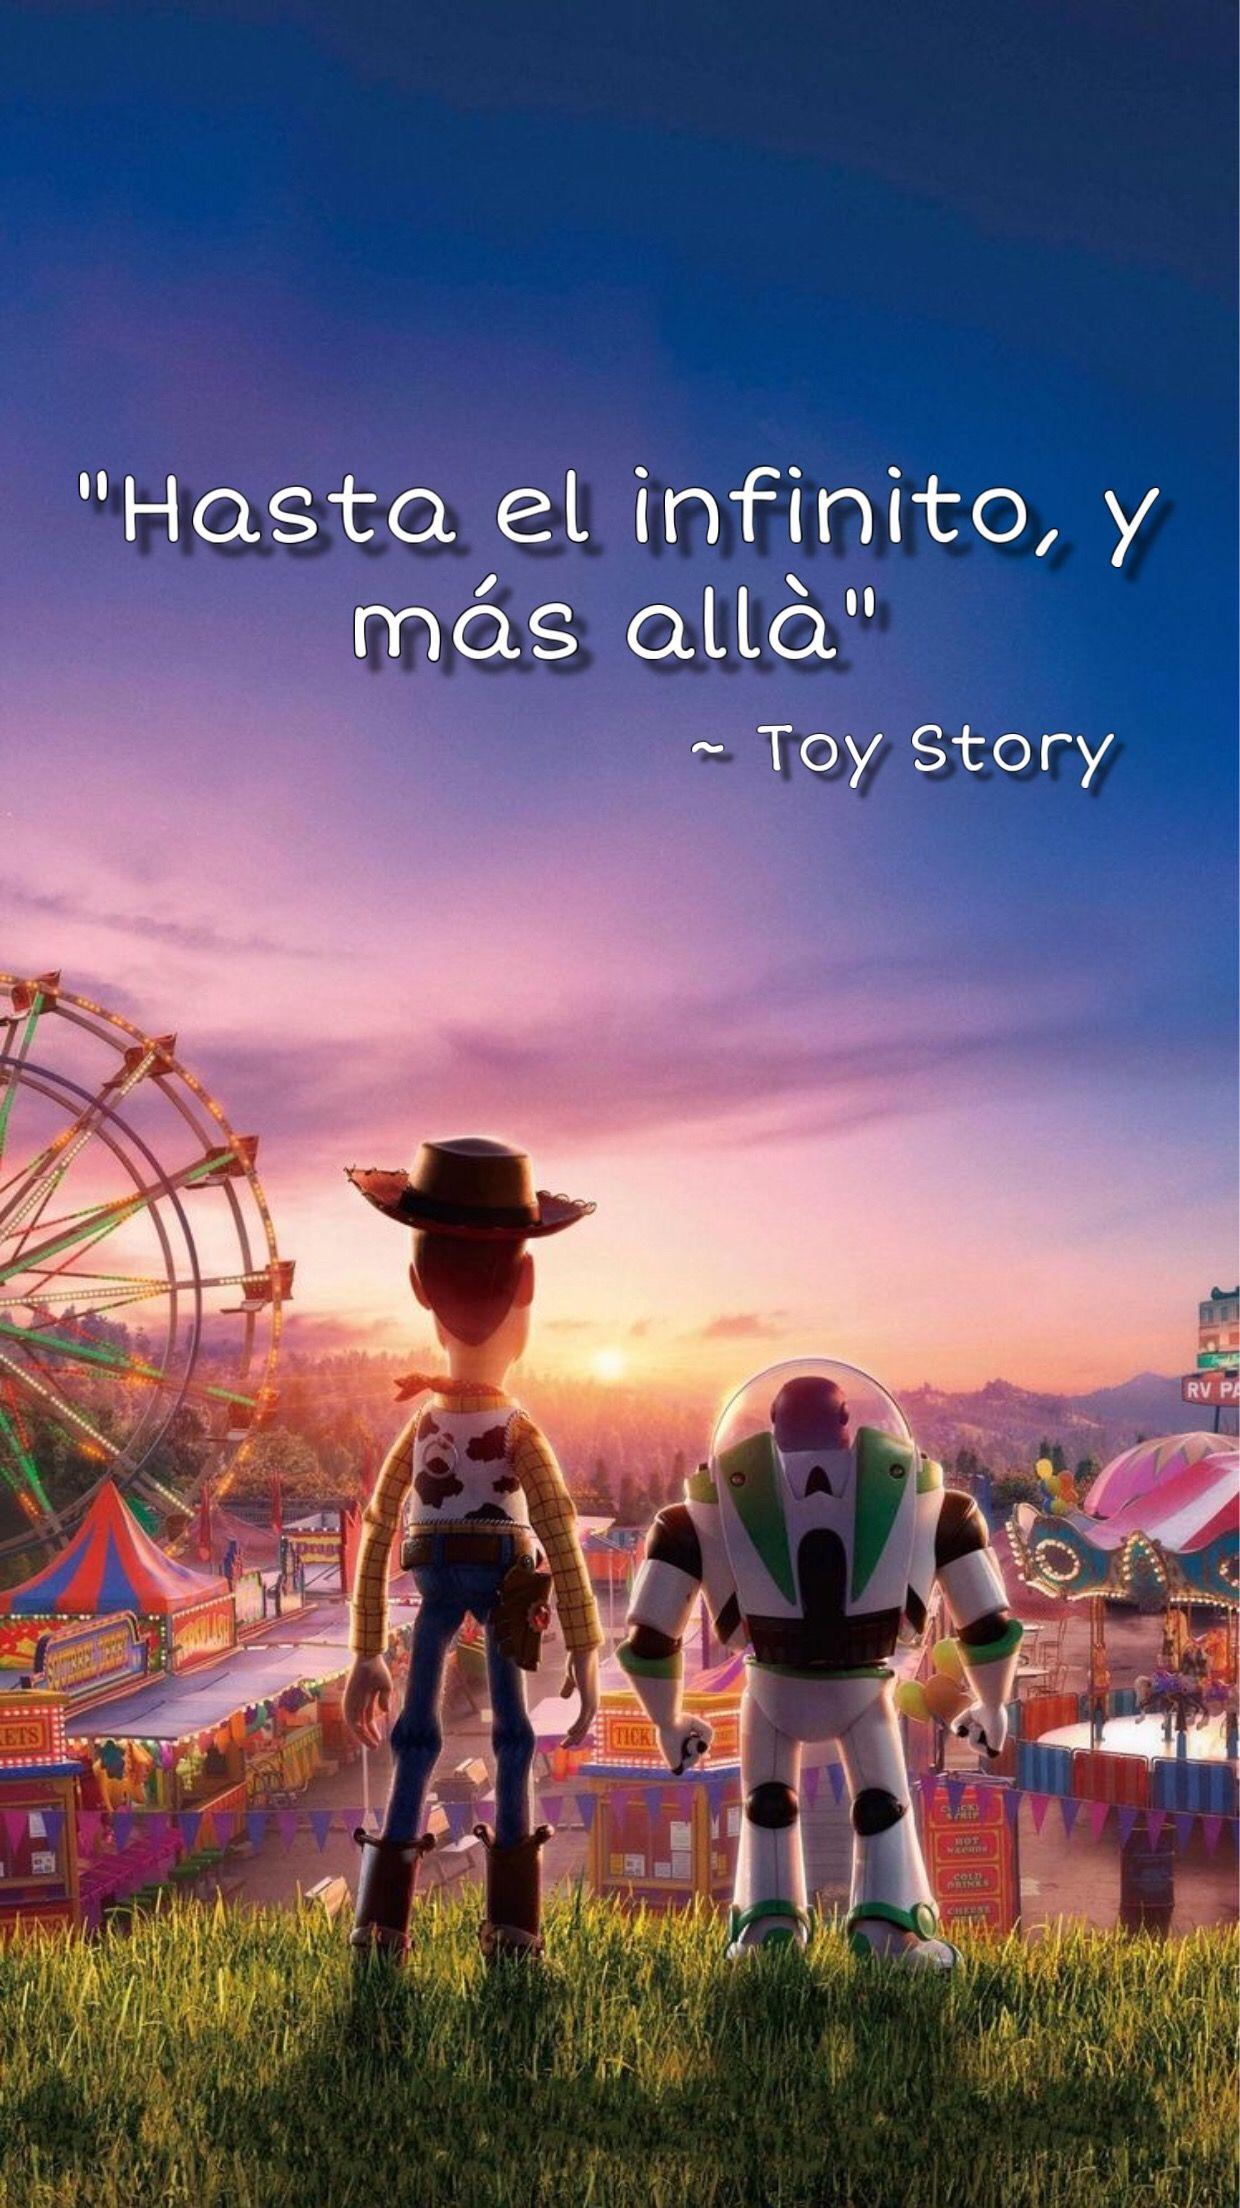 Pin De Ji En Frases Disney Peliculas De Disney Frases Peliculas Disney Frases De Peliculas